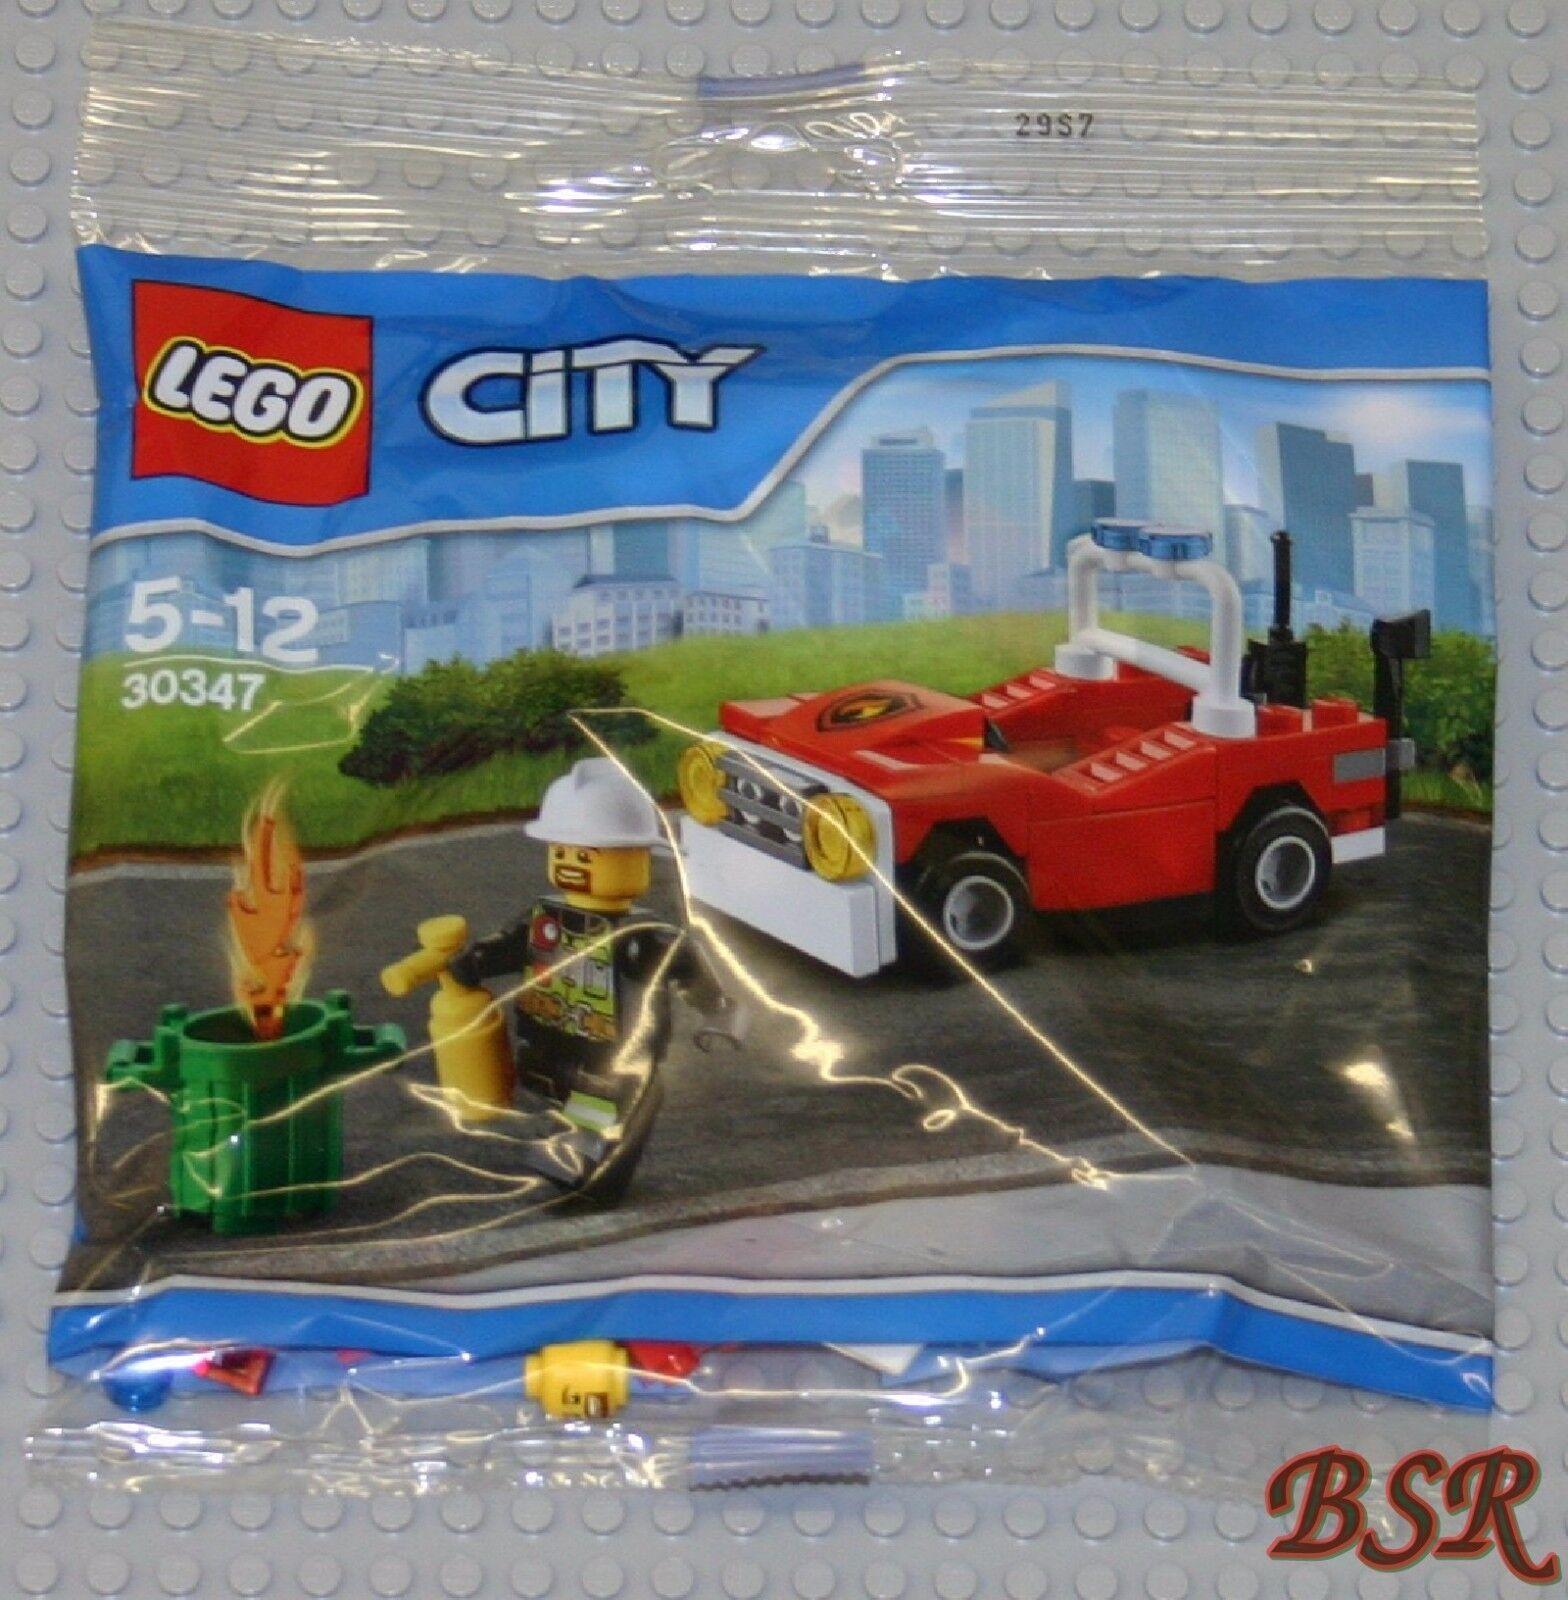 20x LEGO® City Polybag   30347 Feuerwehrauto   NEU & OVP & 0.- Versand